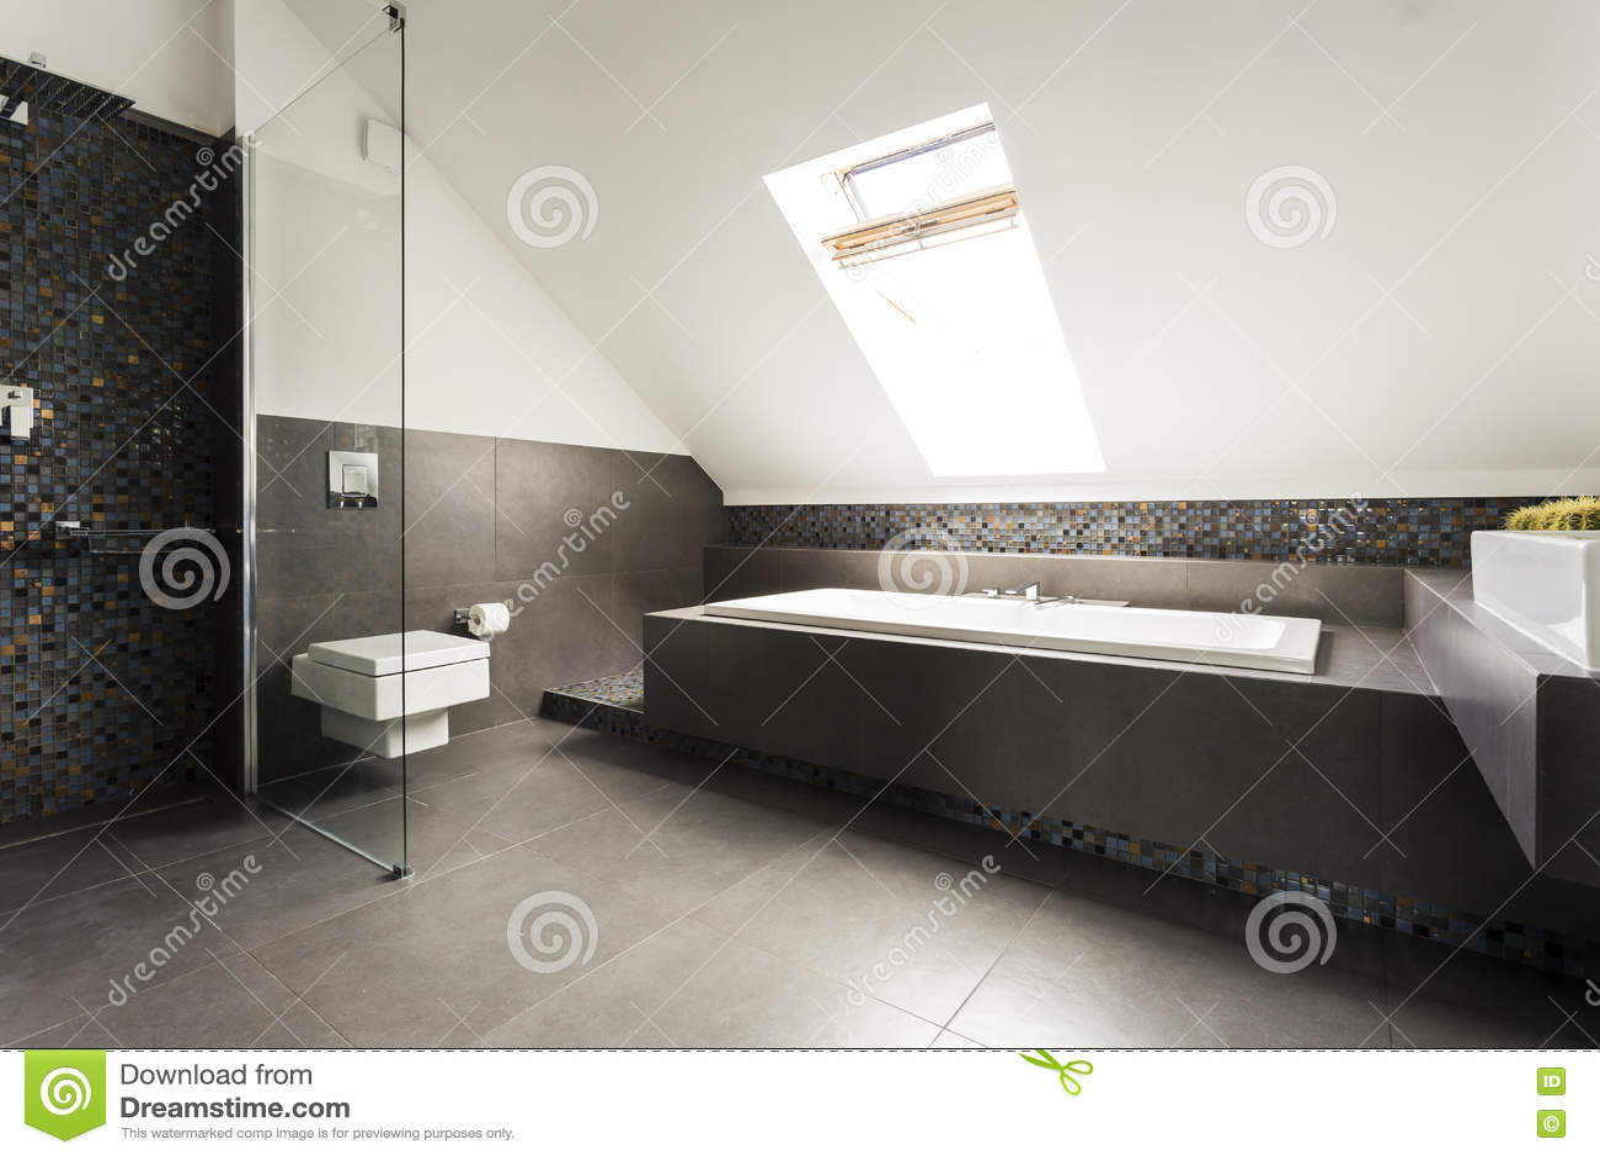 Badkamer zwart wit badkamertegels zwart wit mooie badkamer